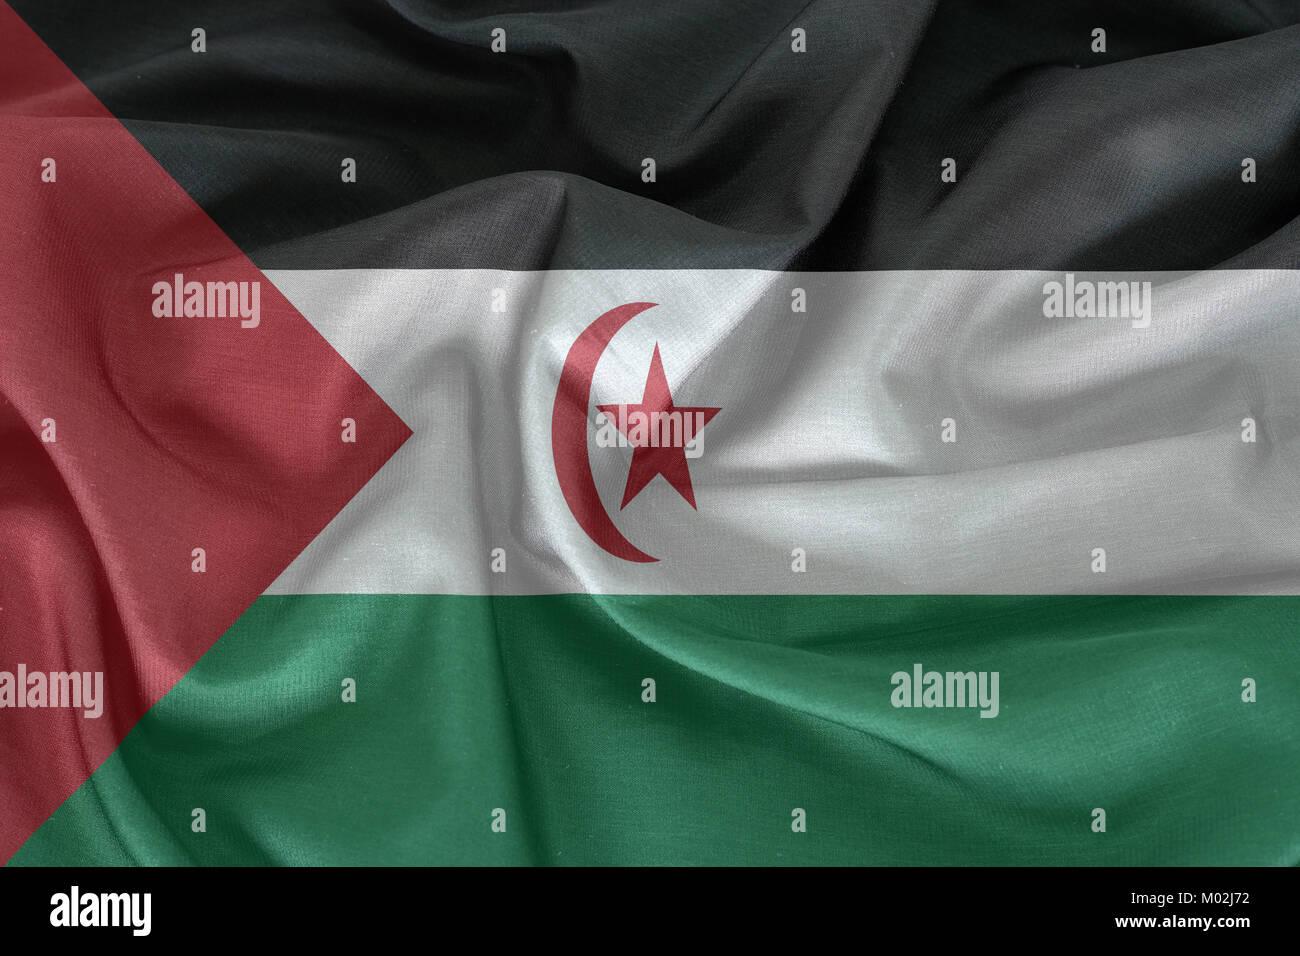 Sahrawi Arab Democratic Republic flag pattern on the fabric texture - Stock Image